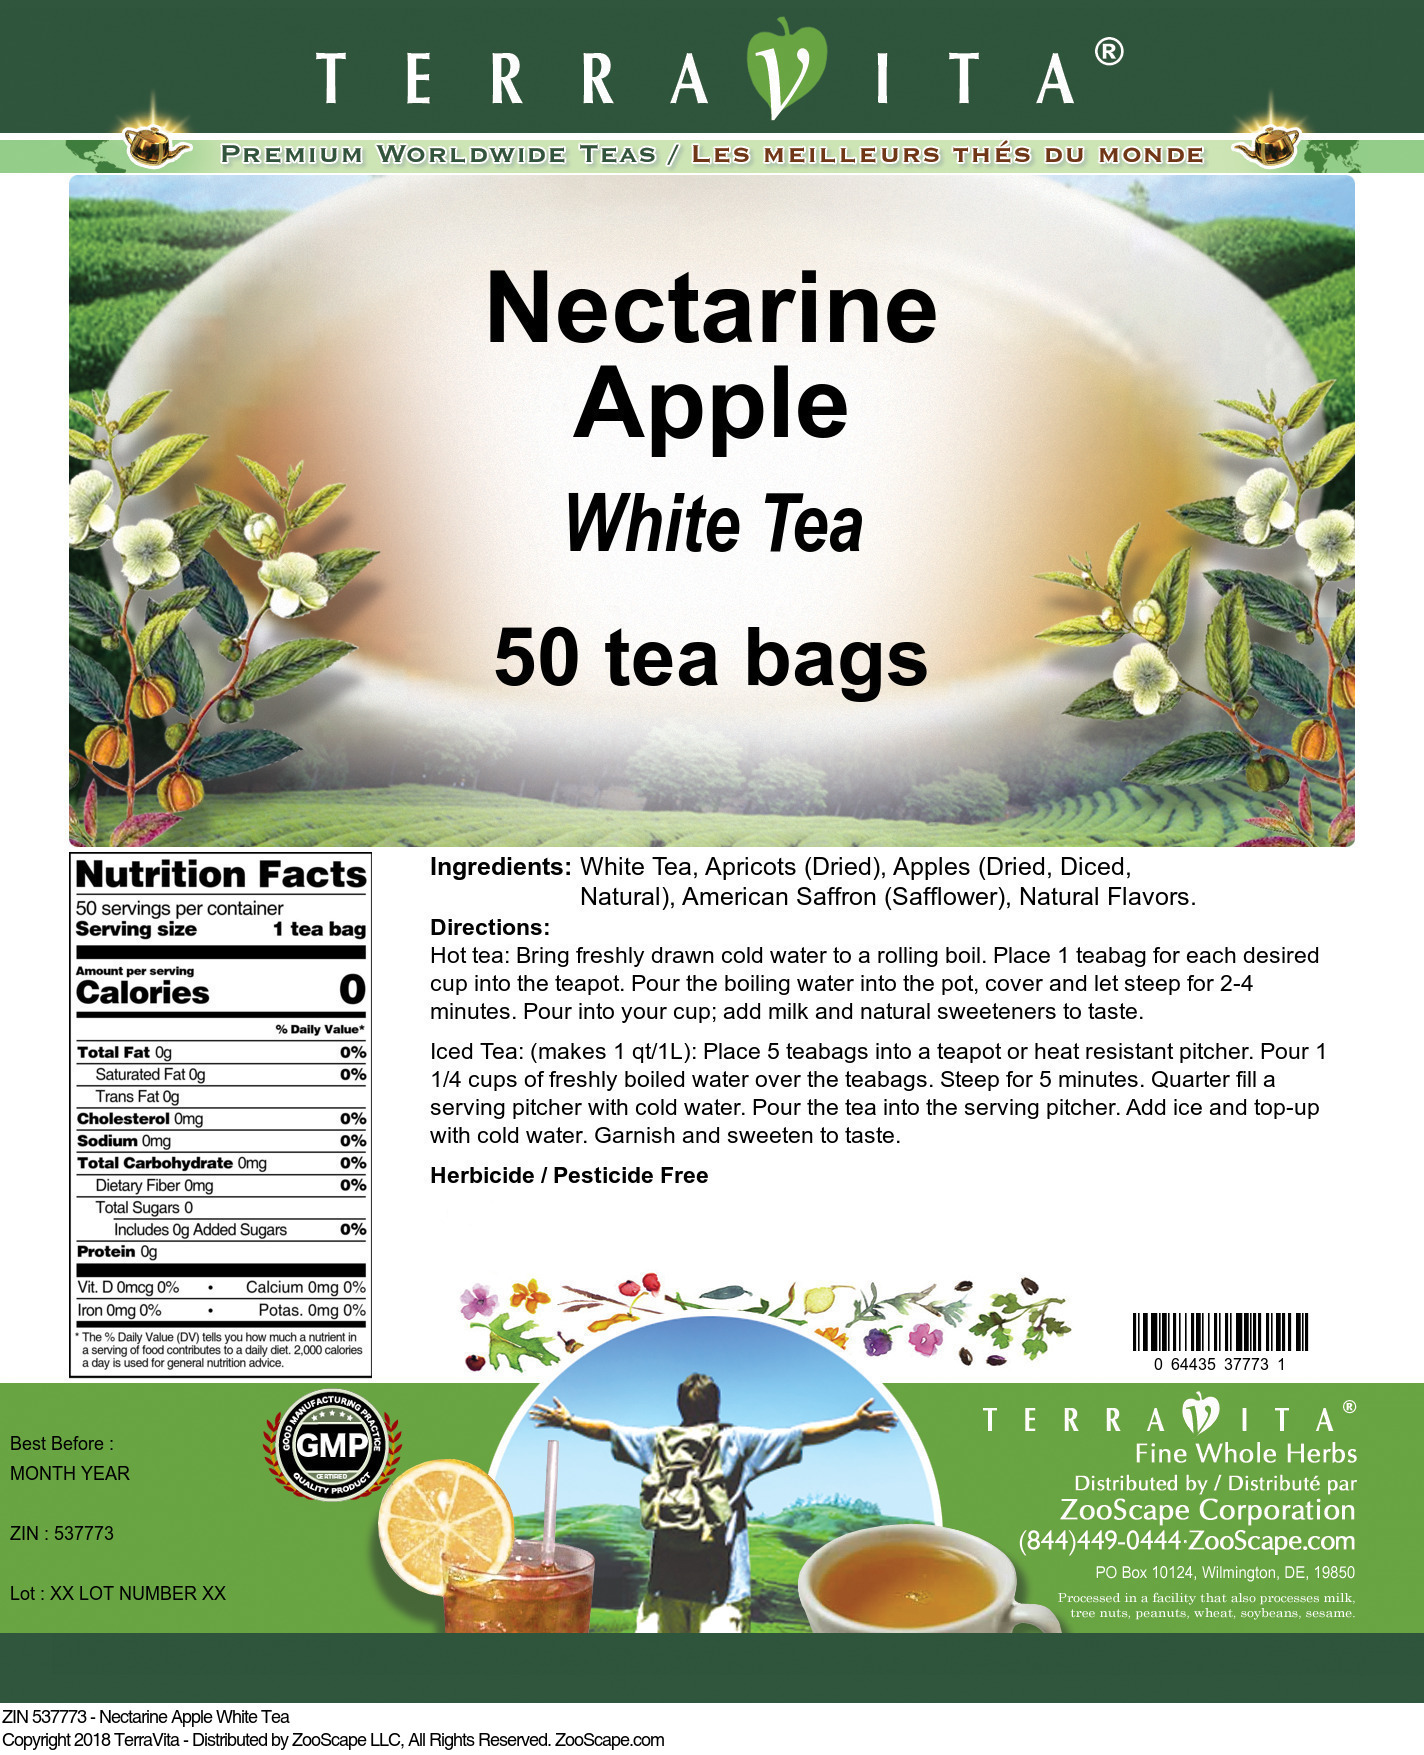 Nectarine Apple White Tea